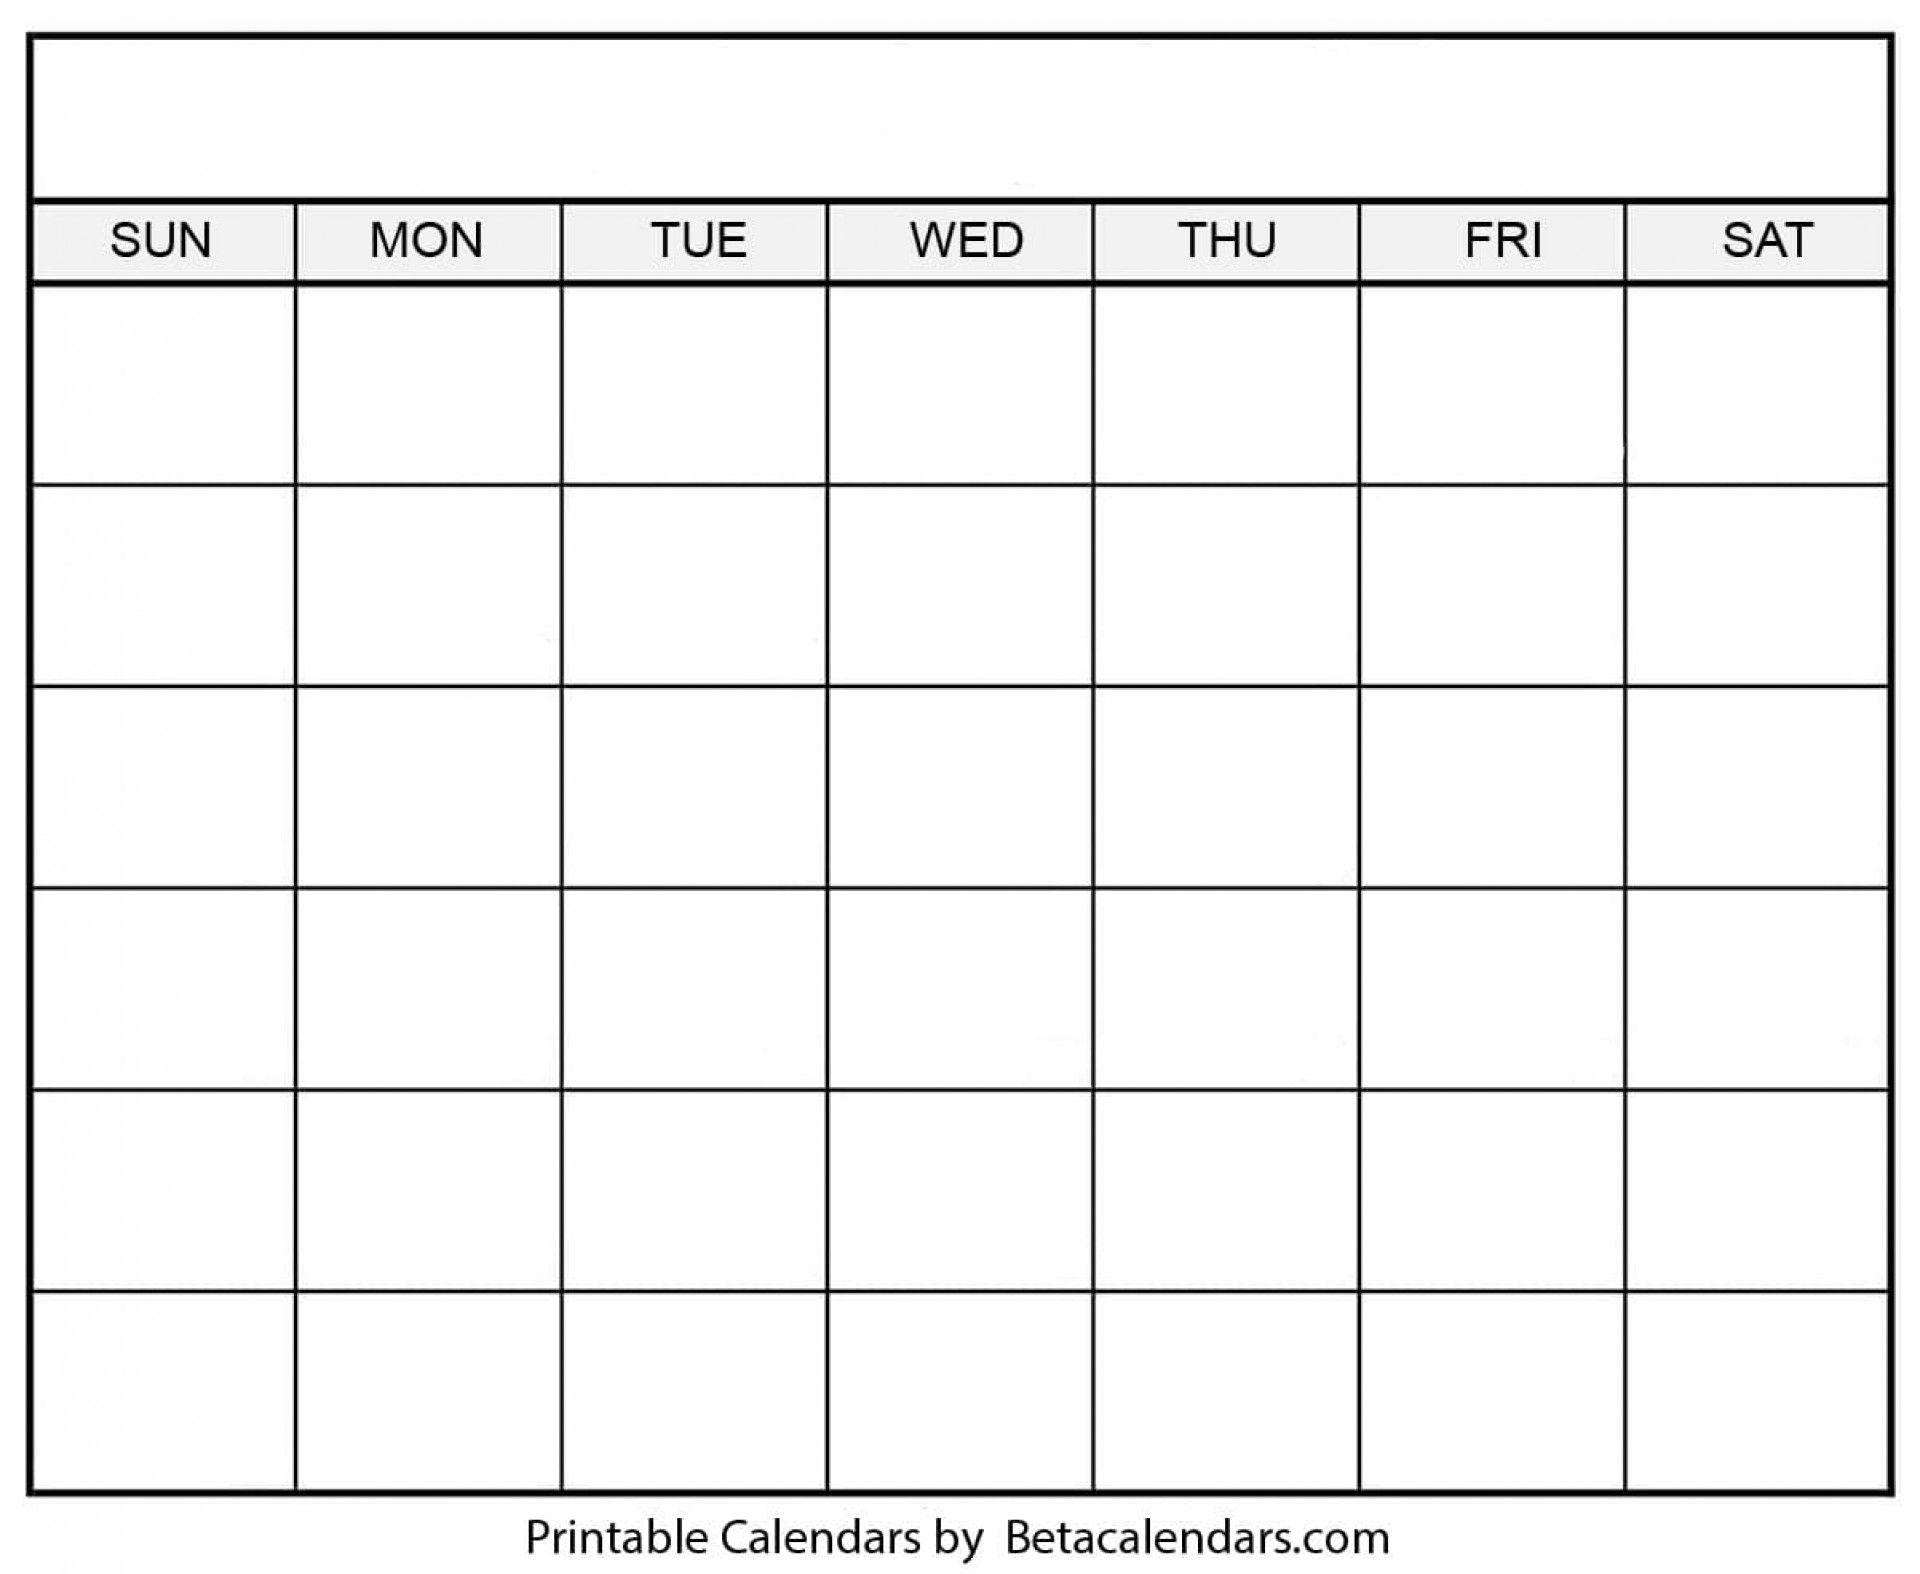 004 Unforgettable 30 Day Calendar Template Photo ~ Addictionary